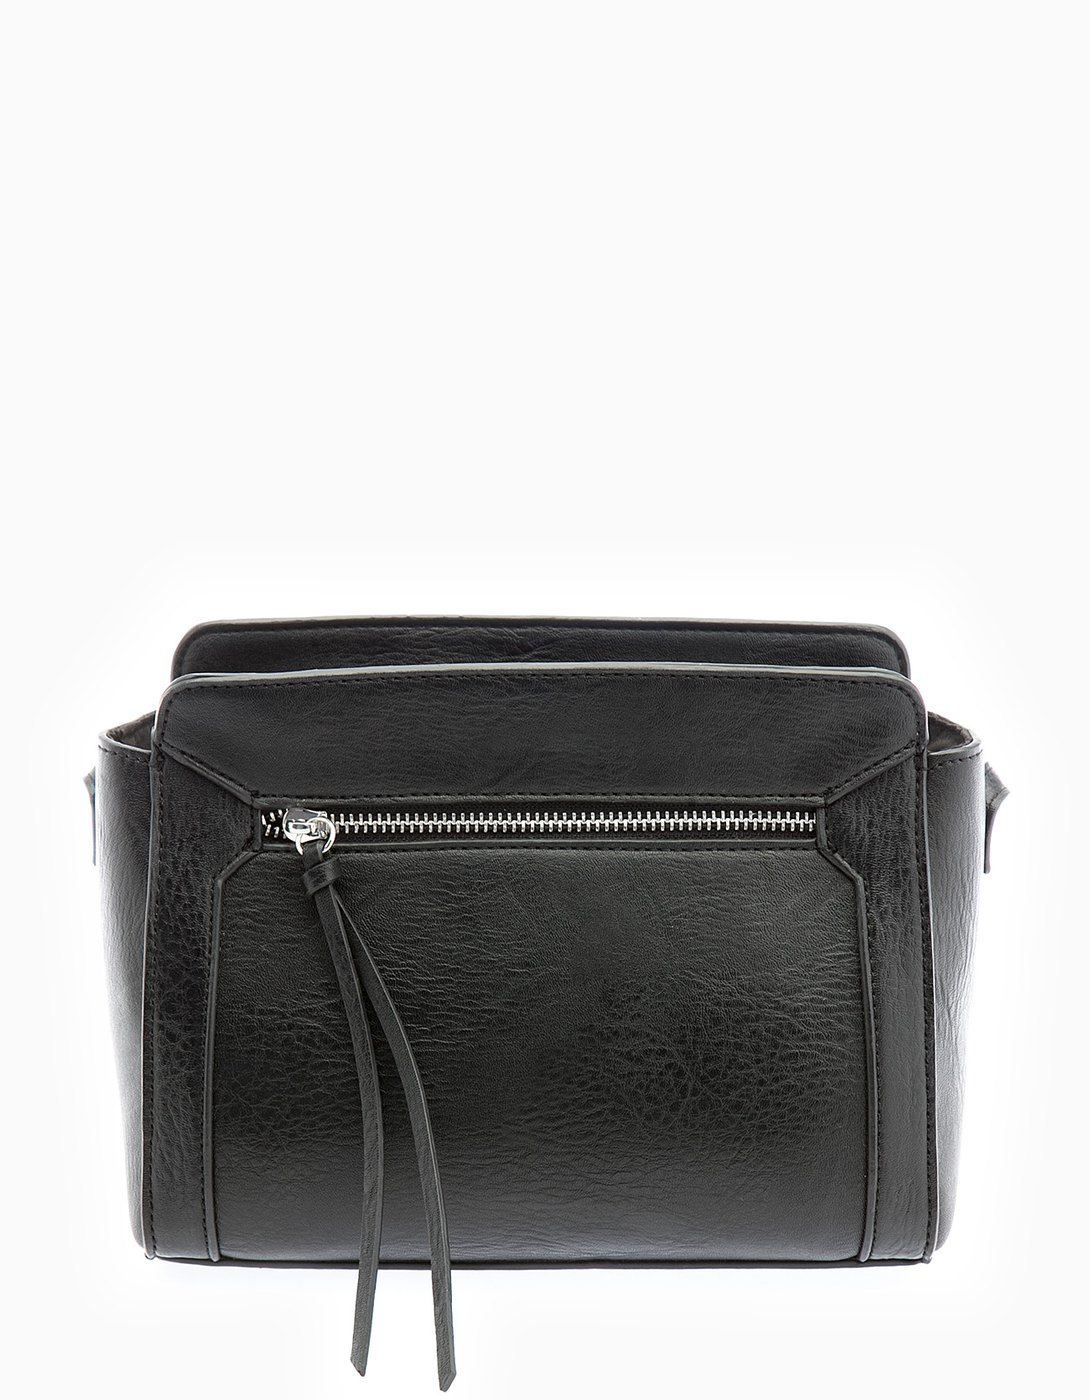 a3cf2a8e06d7 Micro satchel - Bags | Stradivarius Hungary | Lookbook in 2019 ...